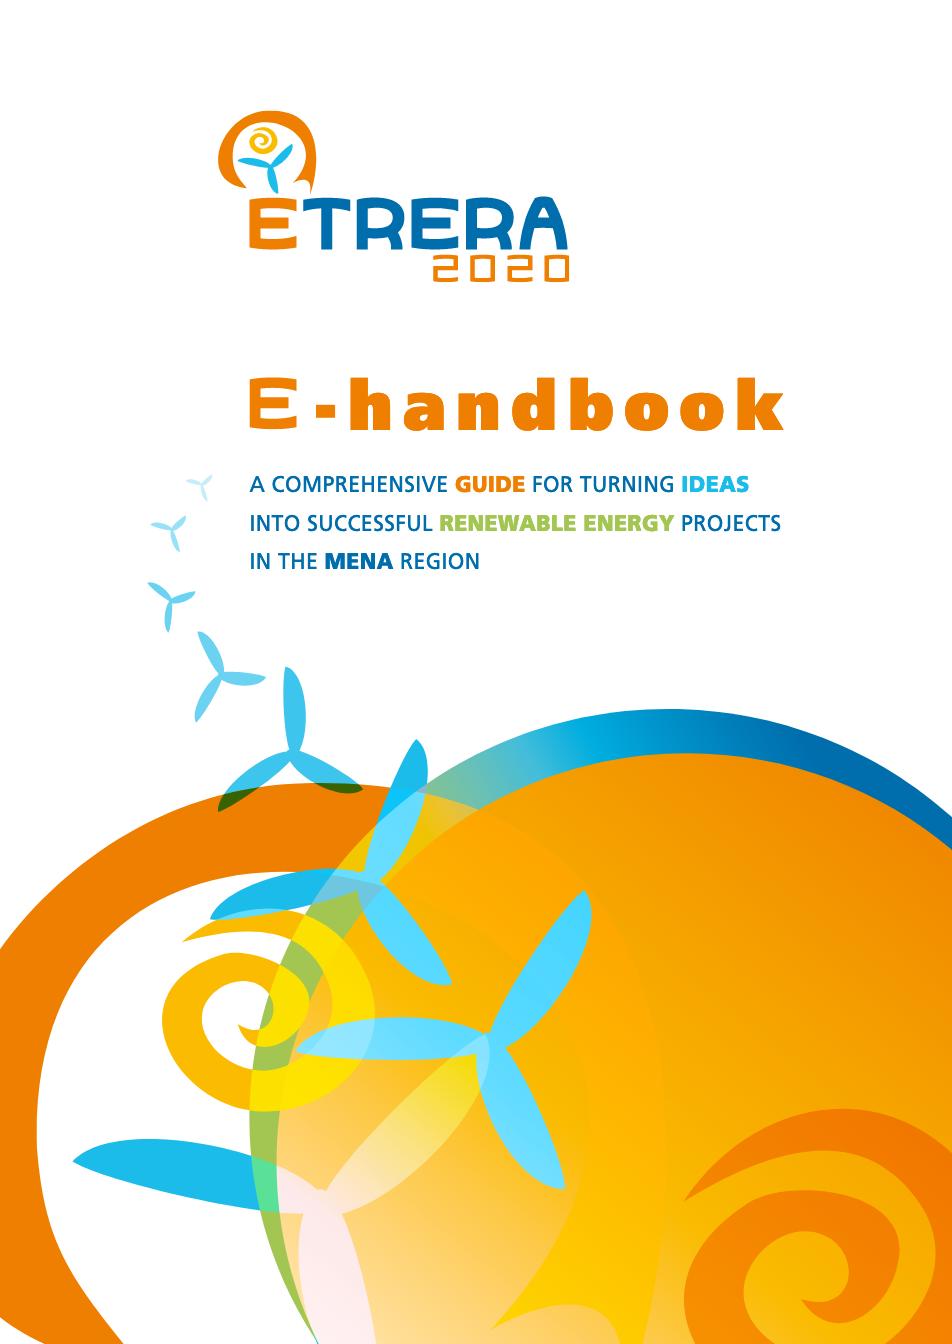 ETRERA 2020 Handbook